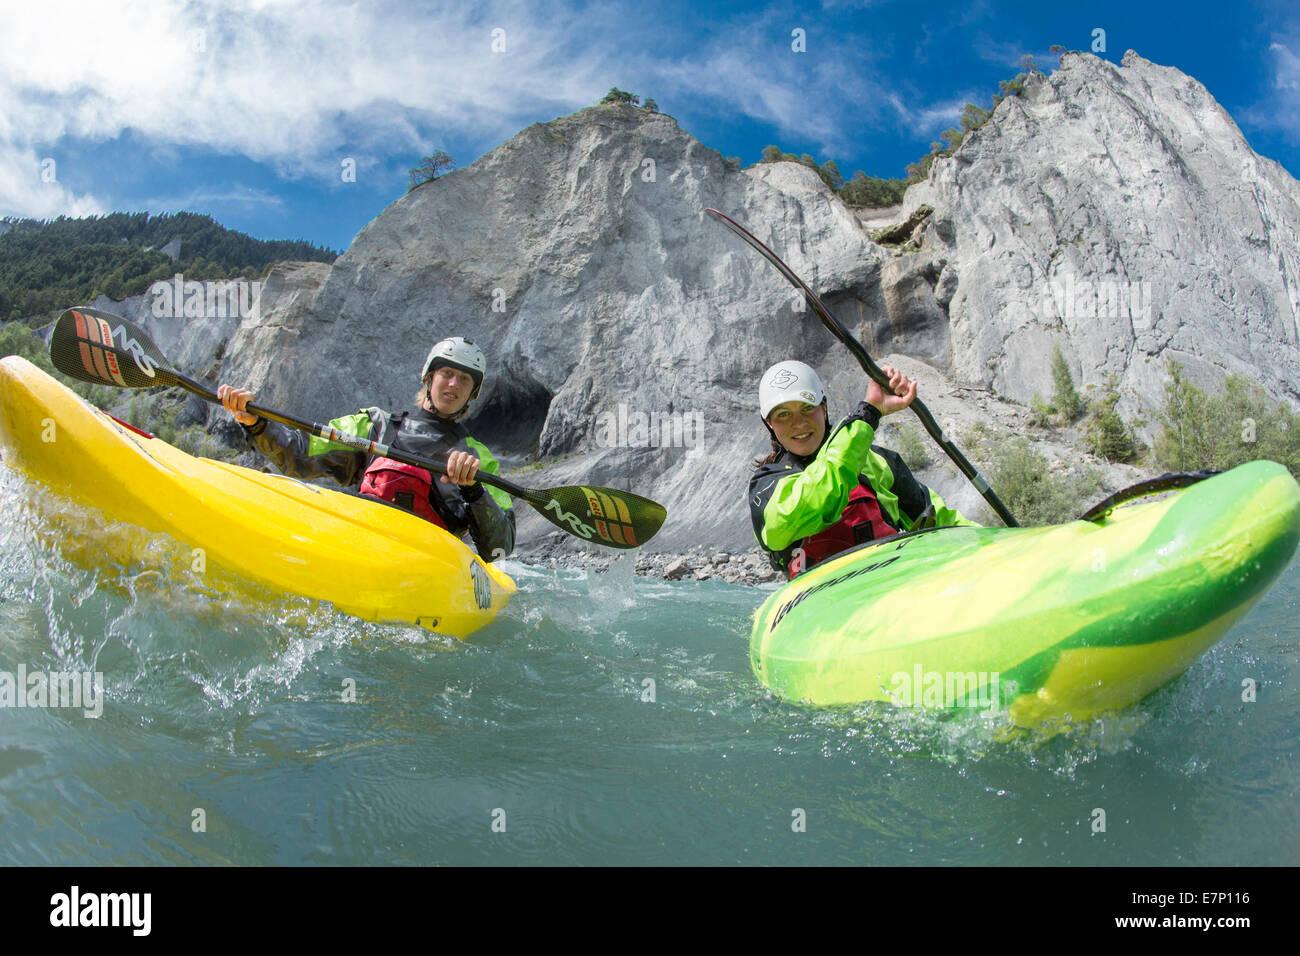 Rhein Schlucht, Wasser sport, Versam, GR, Fluss, Fluss, Körper des Wassers, Wasser, Schlucht, Kanton Graubünden, Stockbild